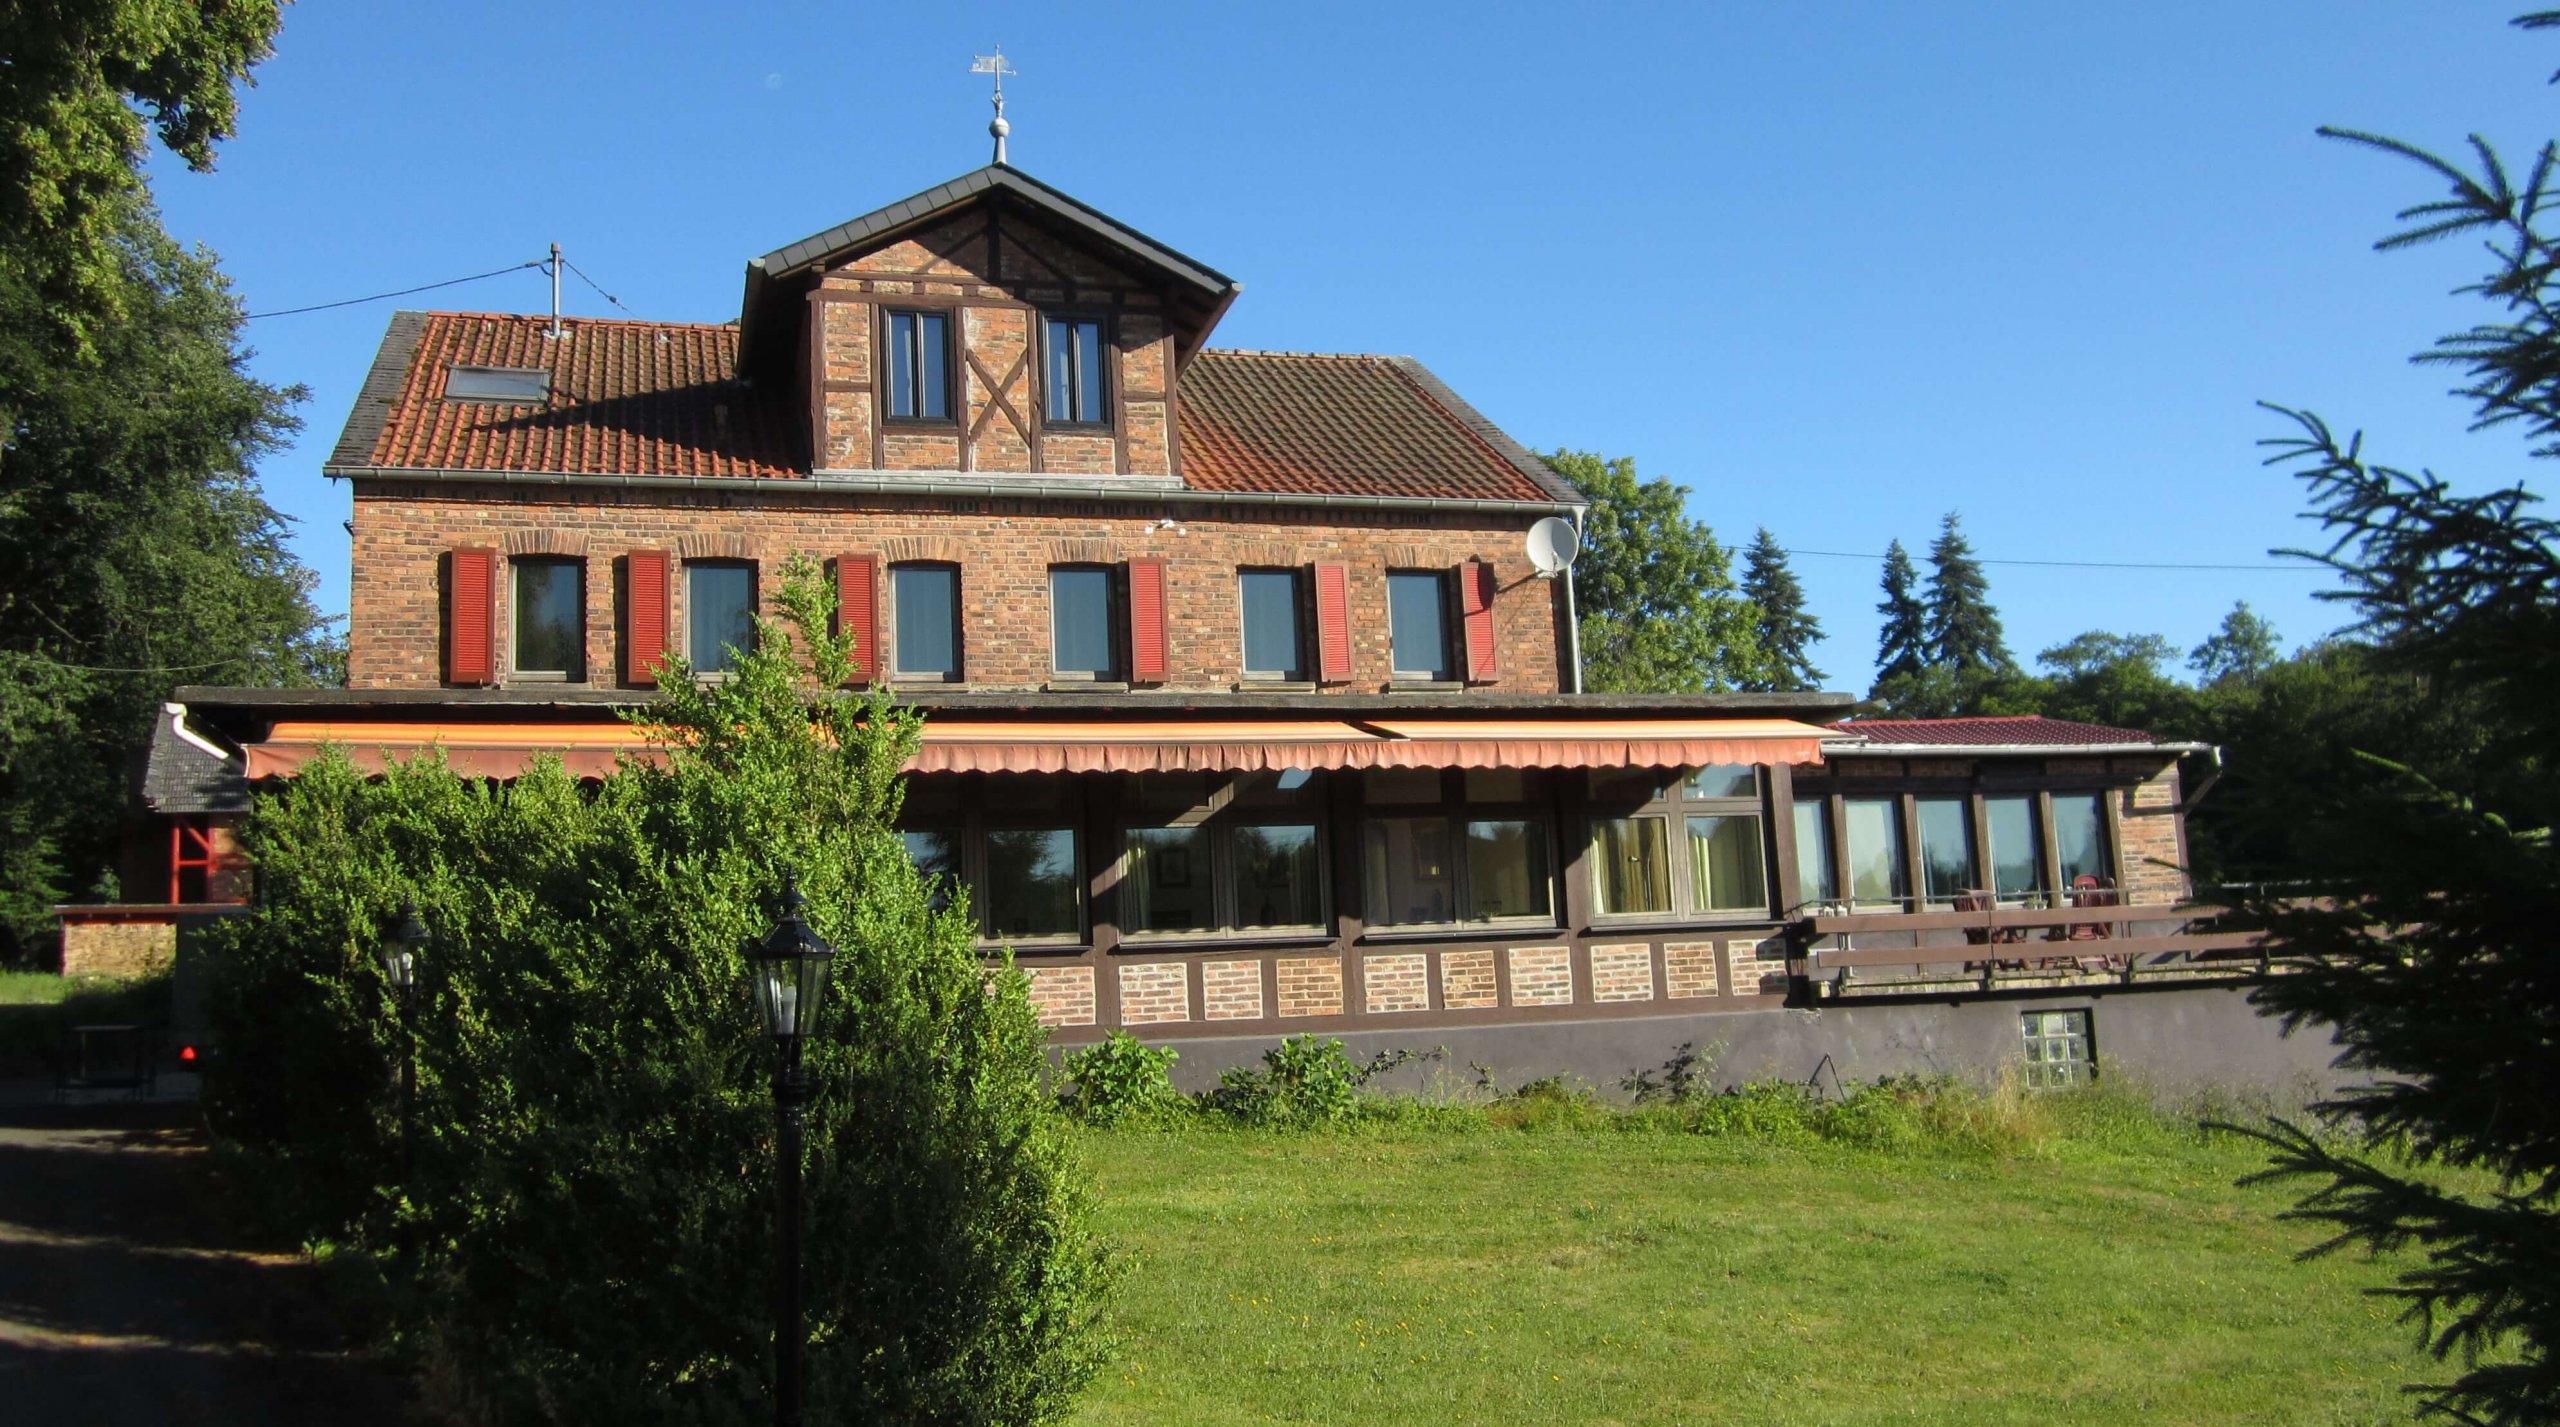 Huis waldfriede